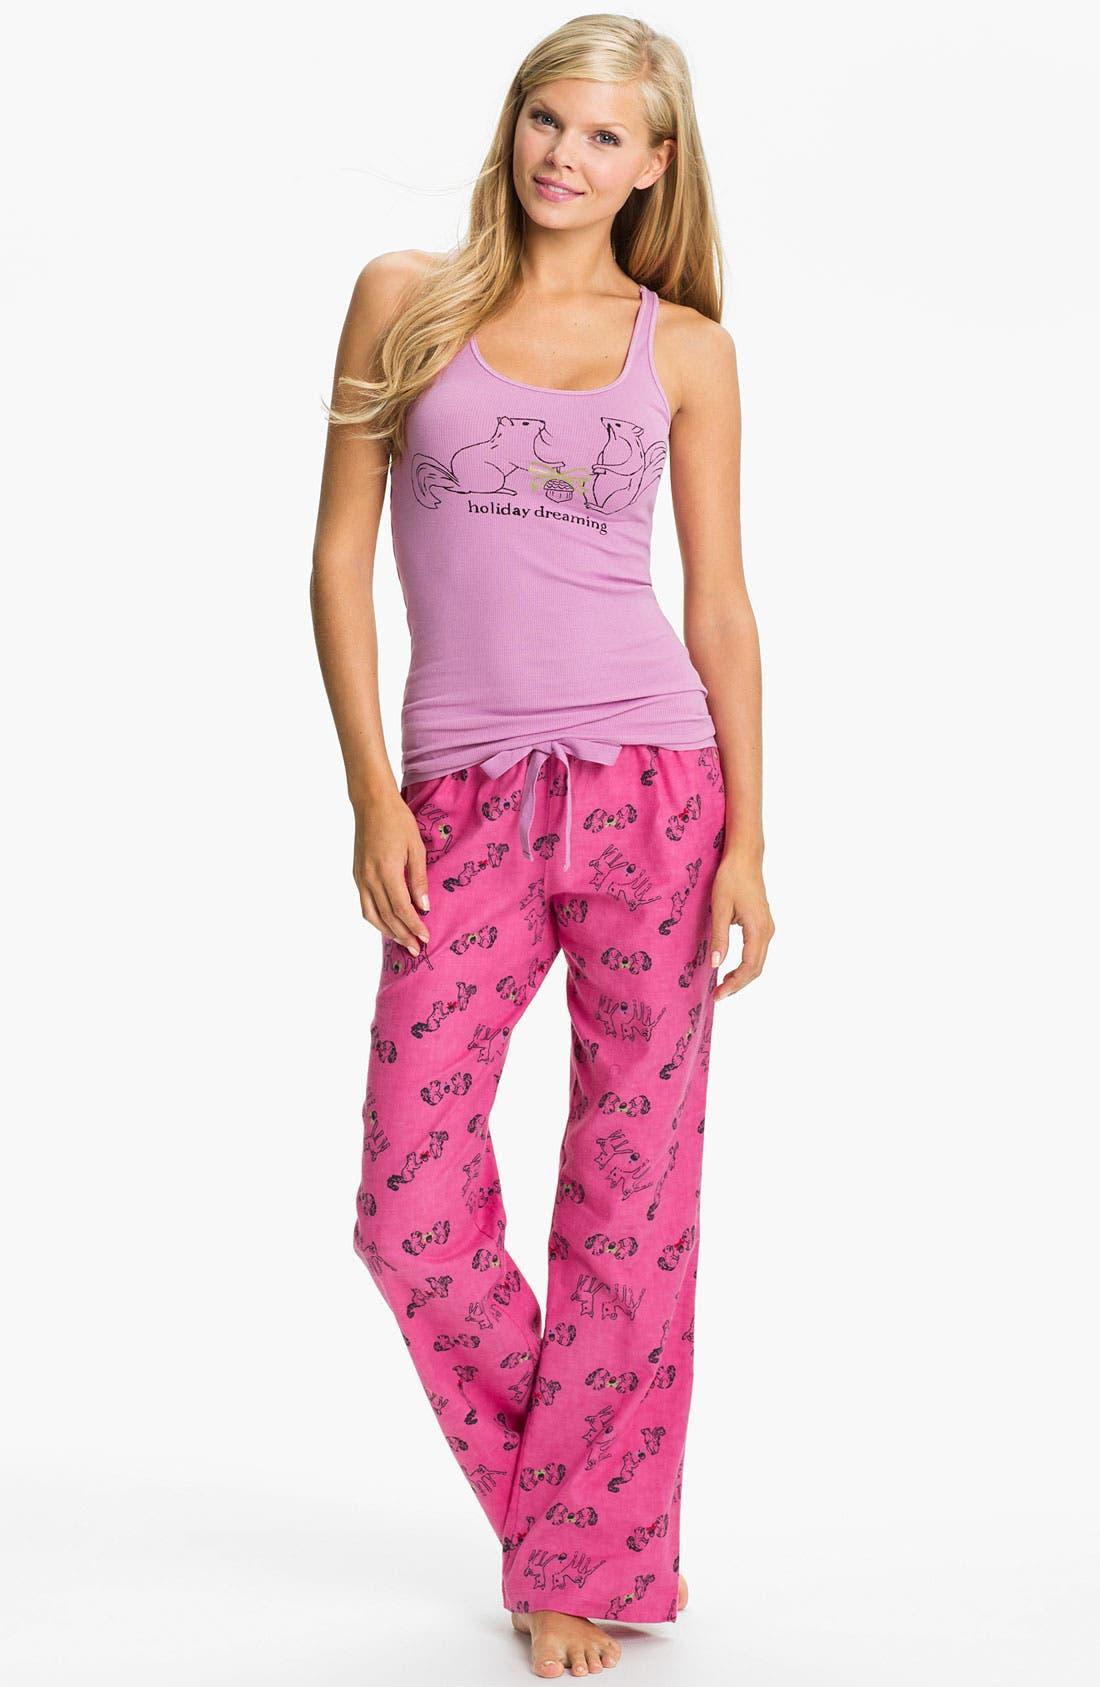 Main Image - Make + Model Flannel Pajamas Gift set